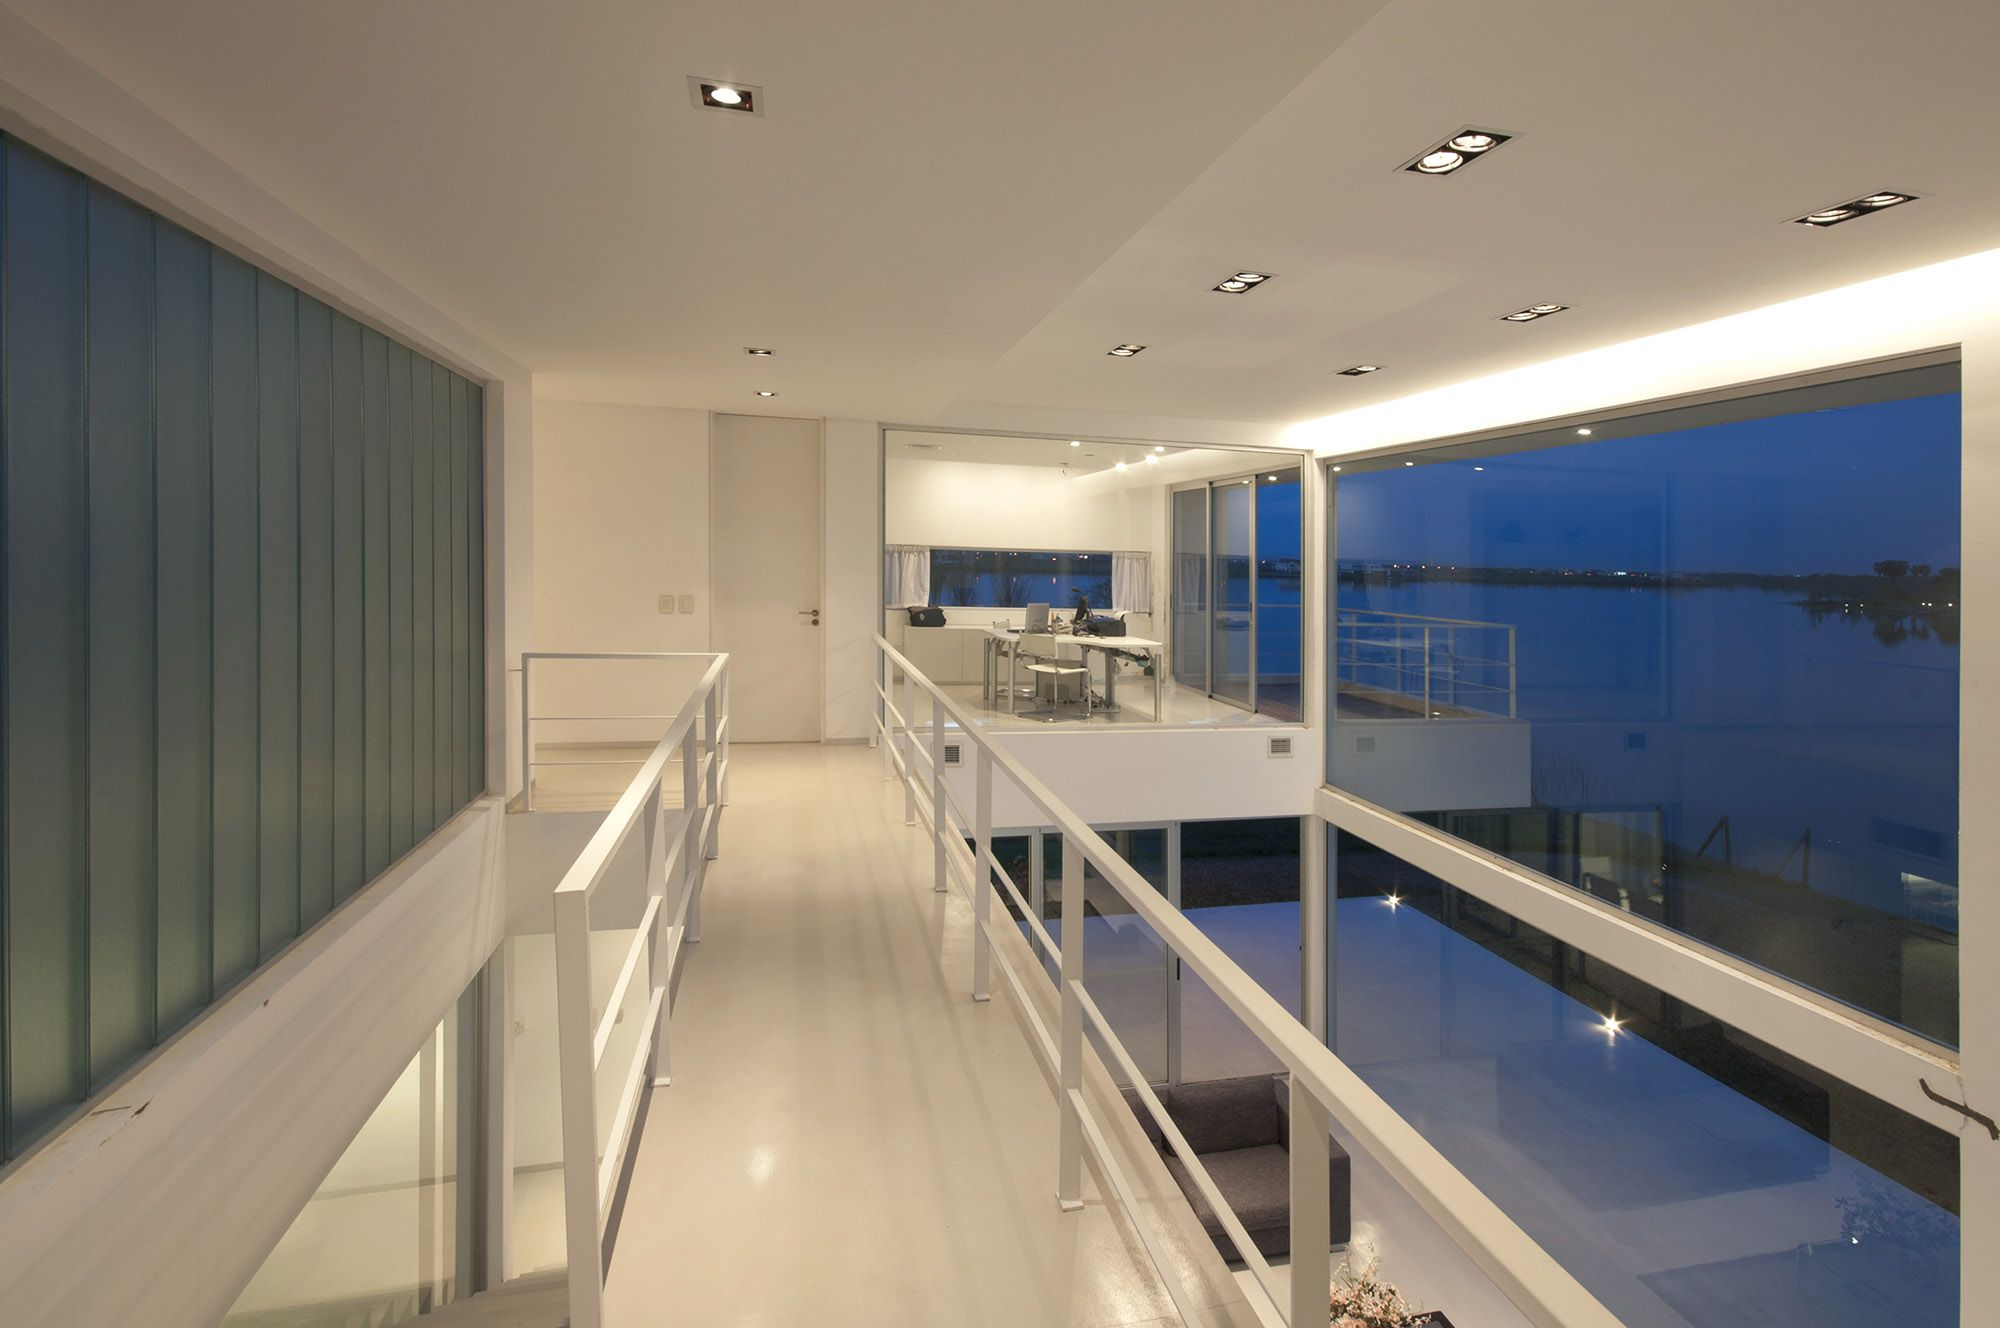 Pool House 71